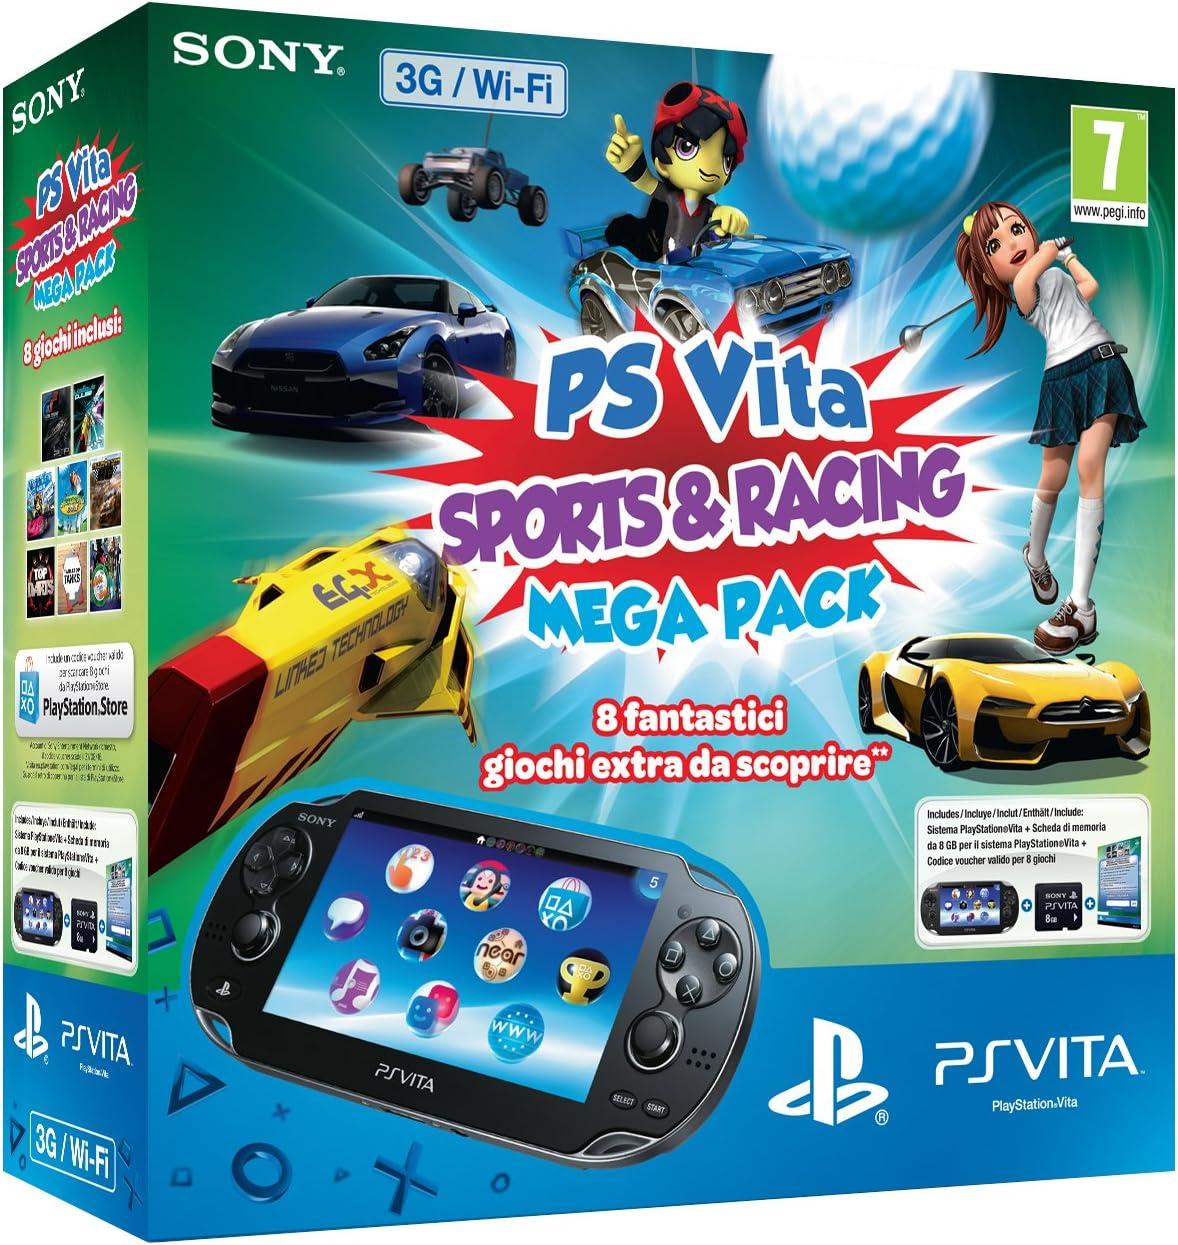 Sony PS Vita 8GB + Mega Pack SR - videoconsolas portátiles ...